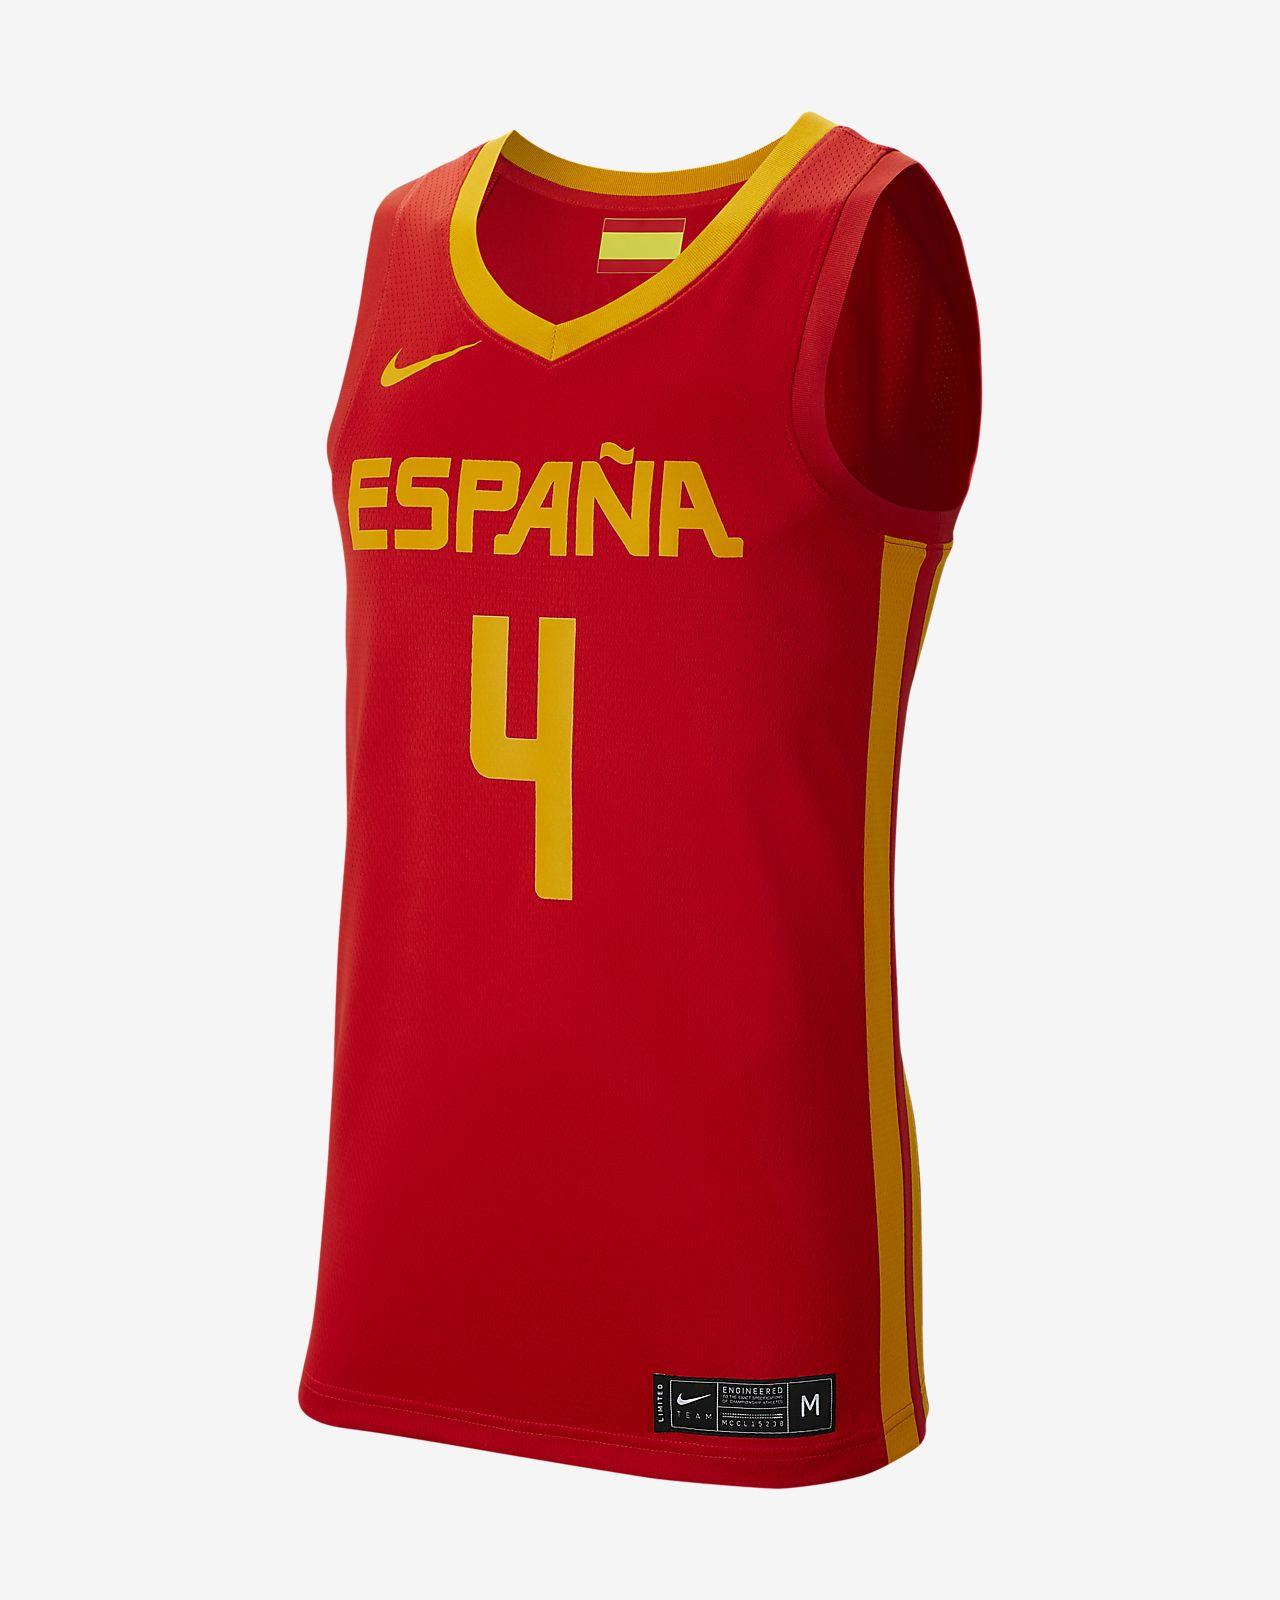 Spain Nike (Road) Men's Basketball Jersey